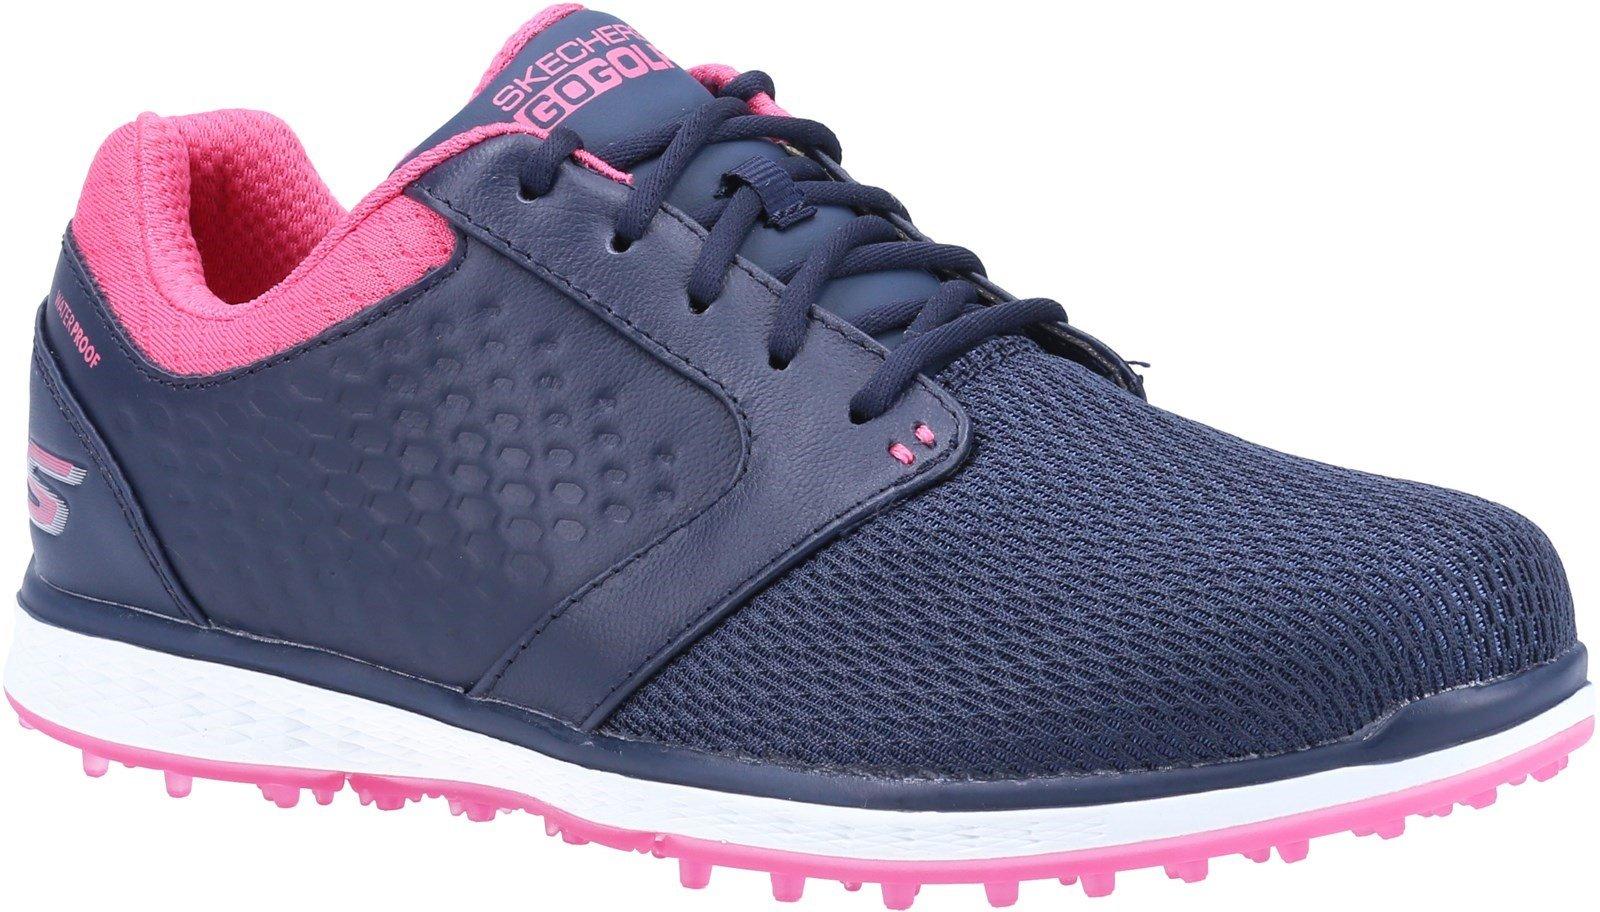 Skechers Women's Elite 3 Grand Sports Trainer Multicolor 32301 - Navy/Pink 3